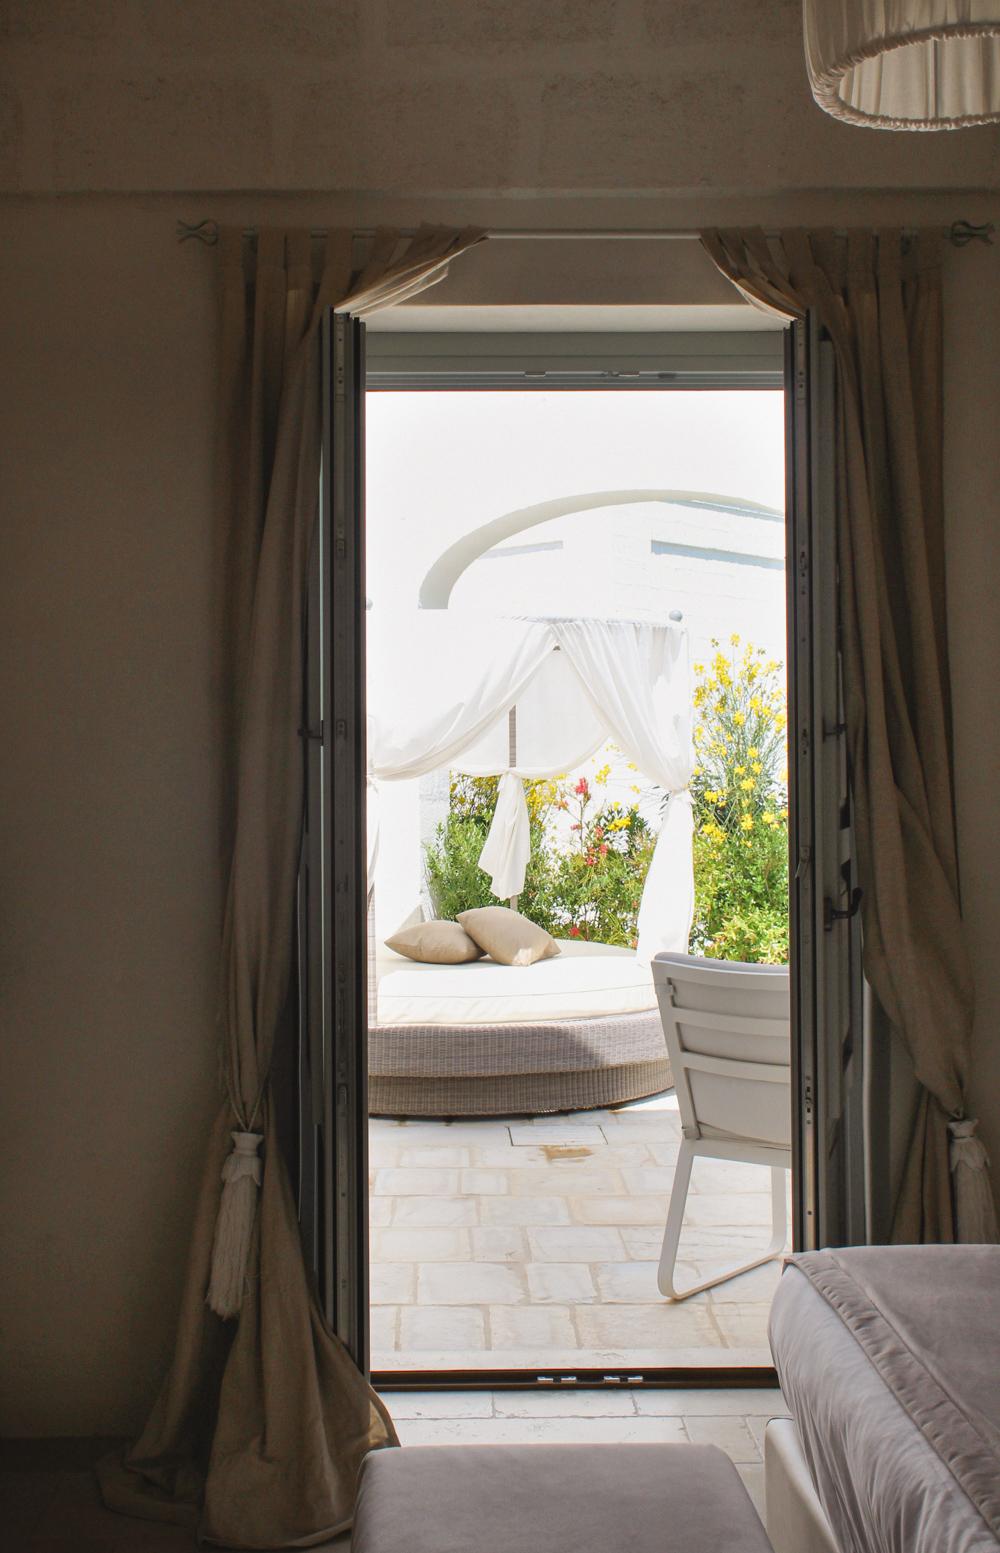 Where to Stay in Puglia